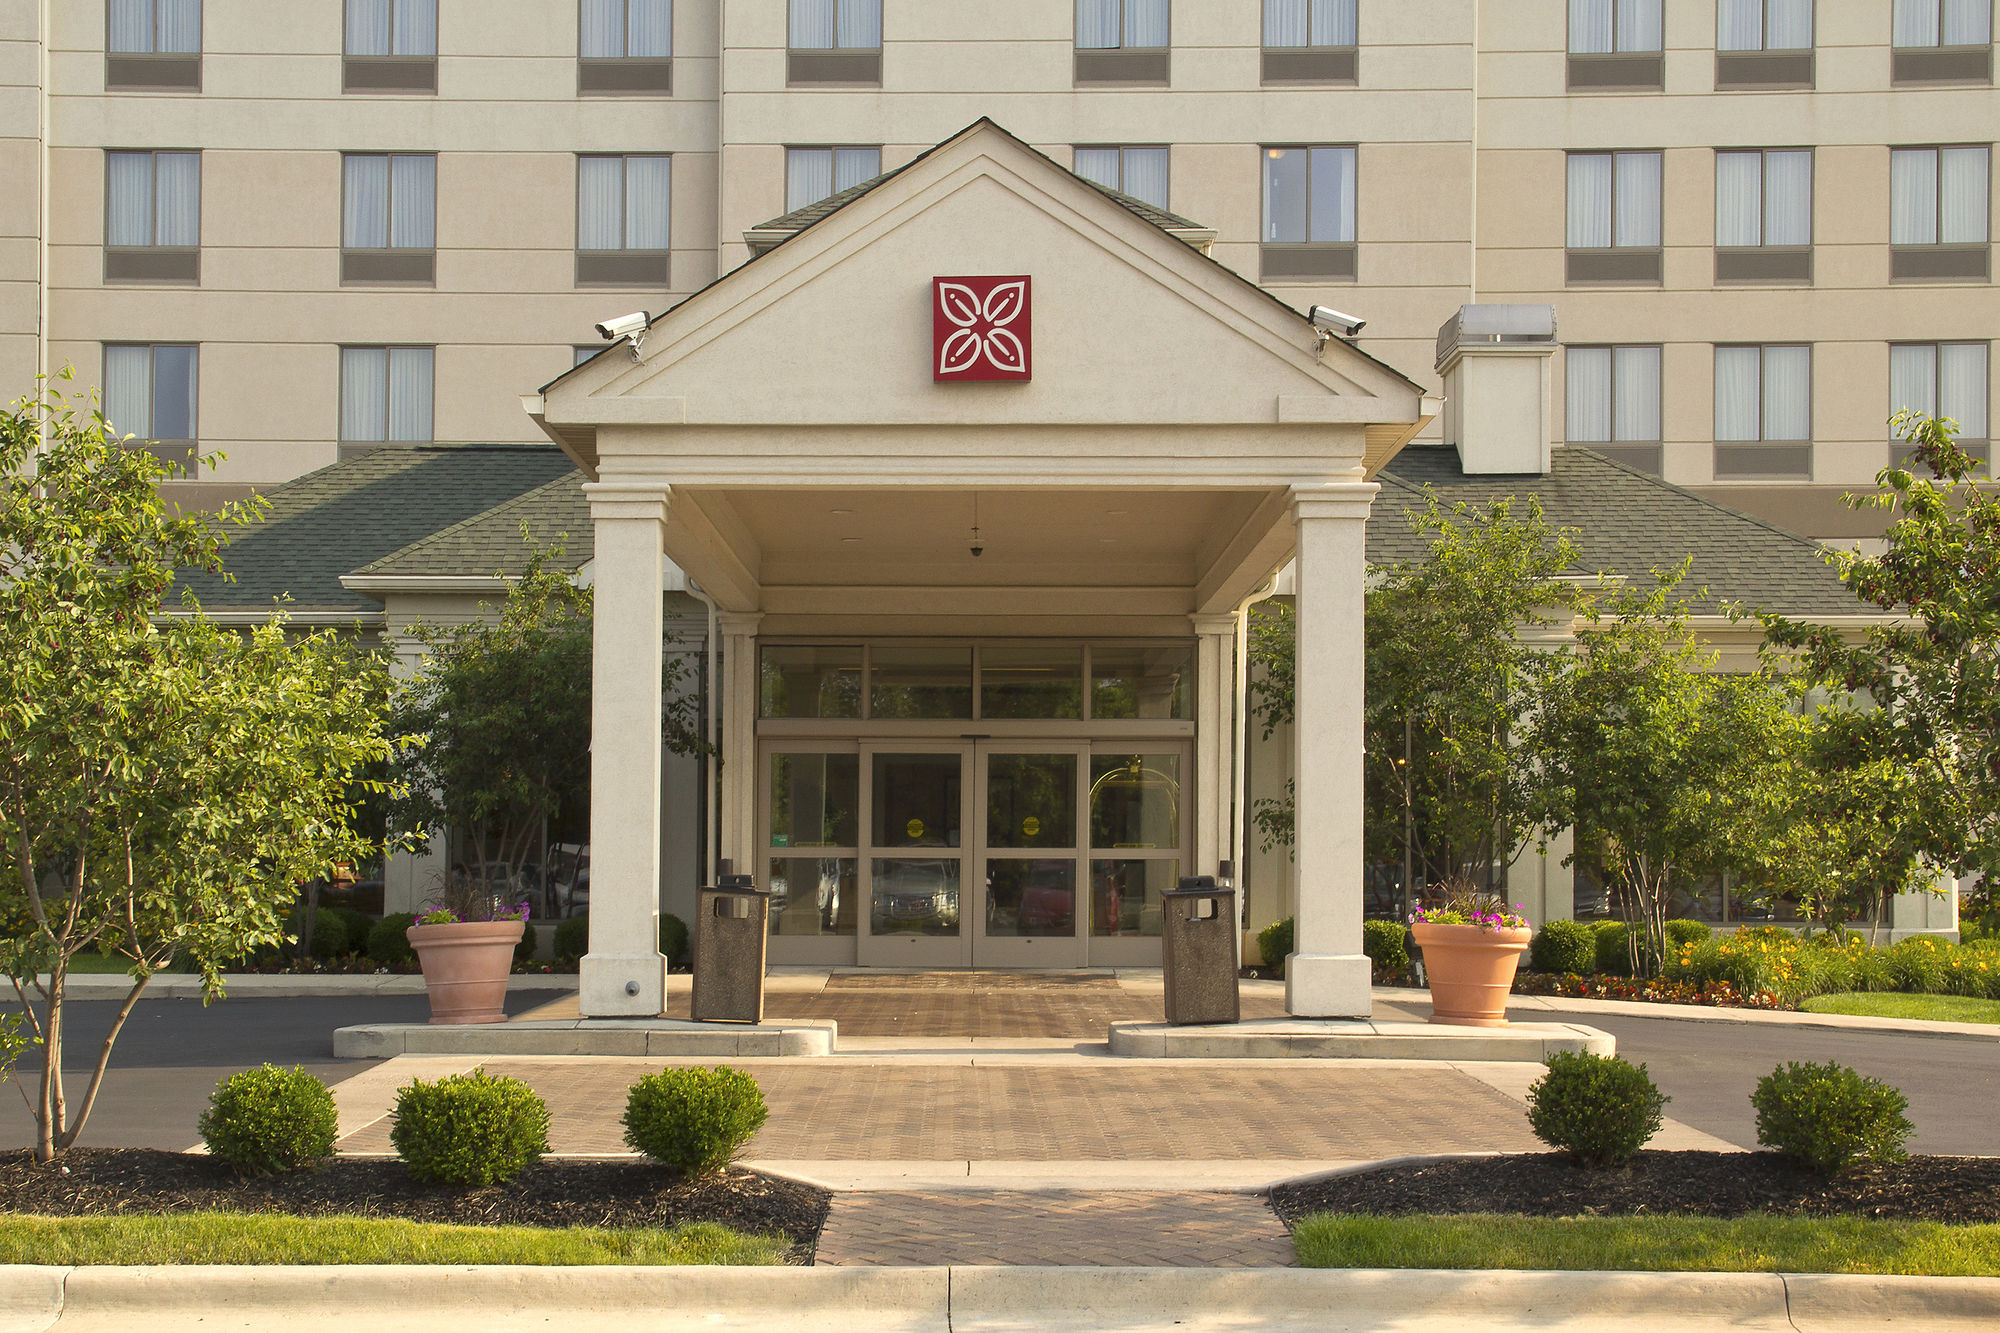 Discount Coupon for Hilton Garden Inn Columbus-University Area in ...